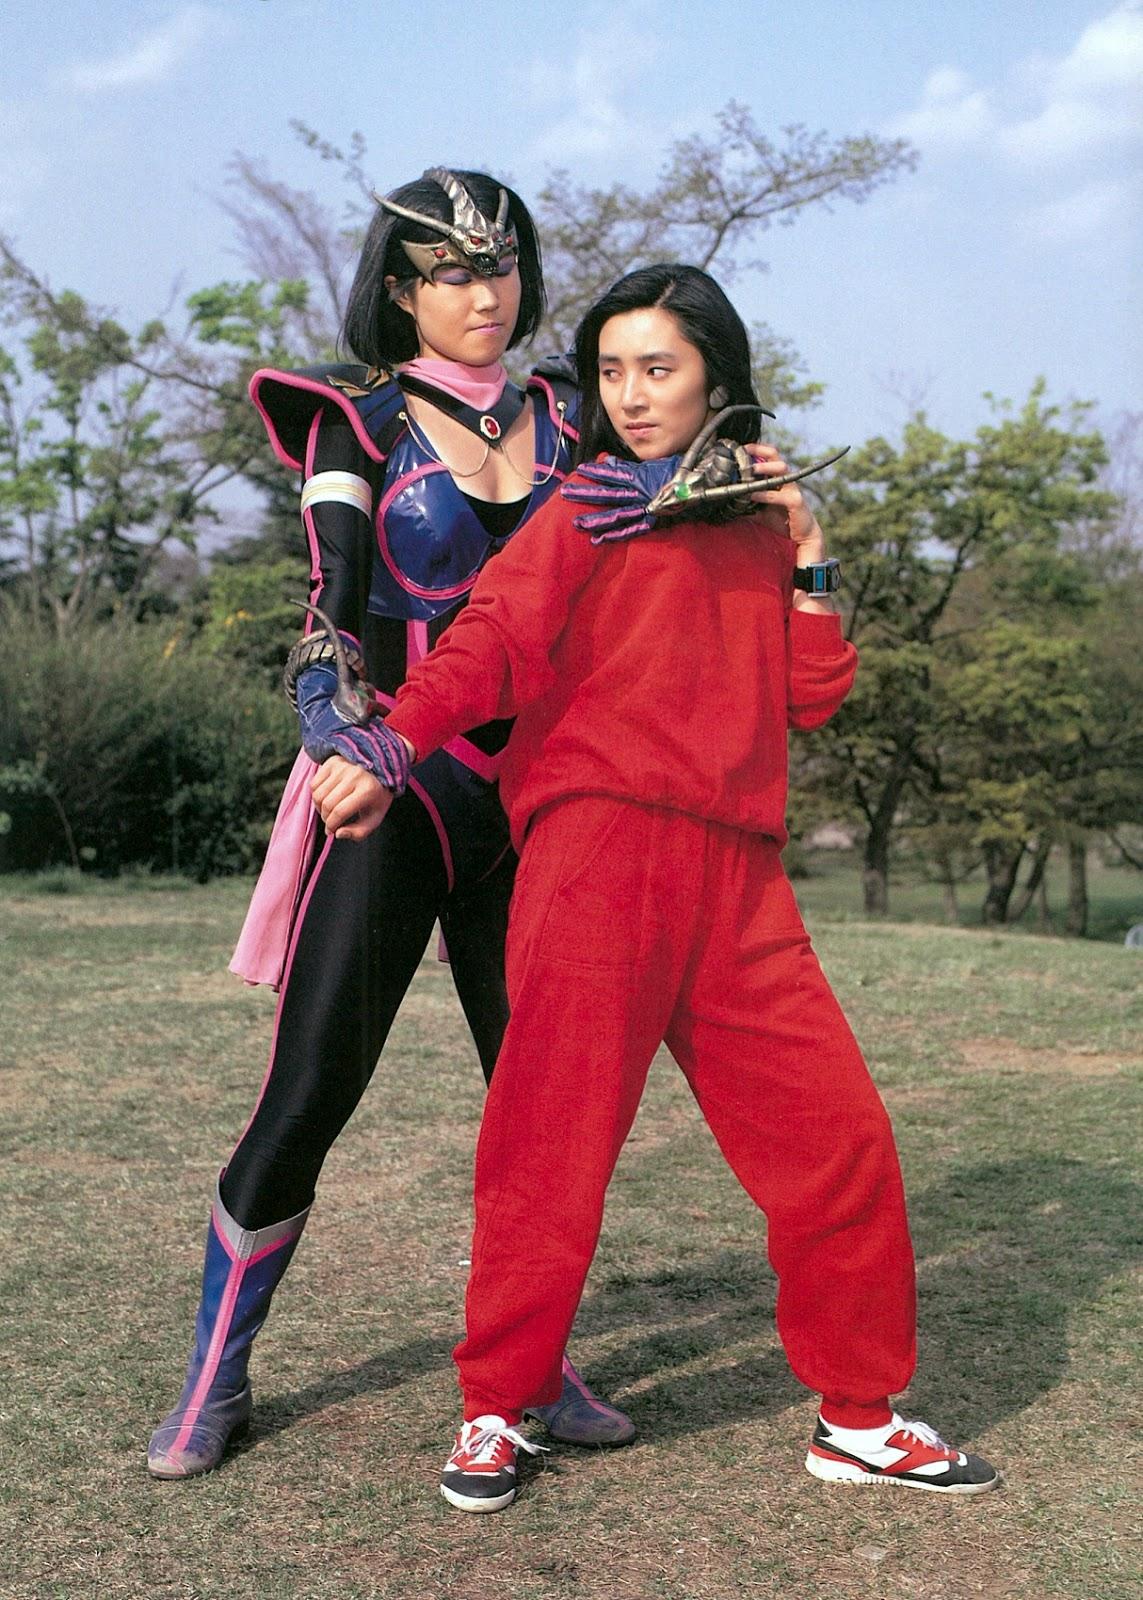 Fuji and diana 2 of 2 - 5 10